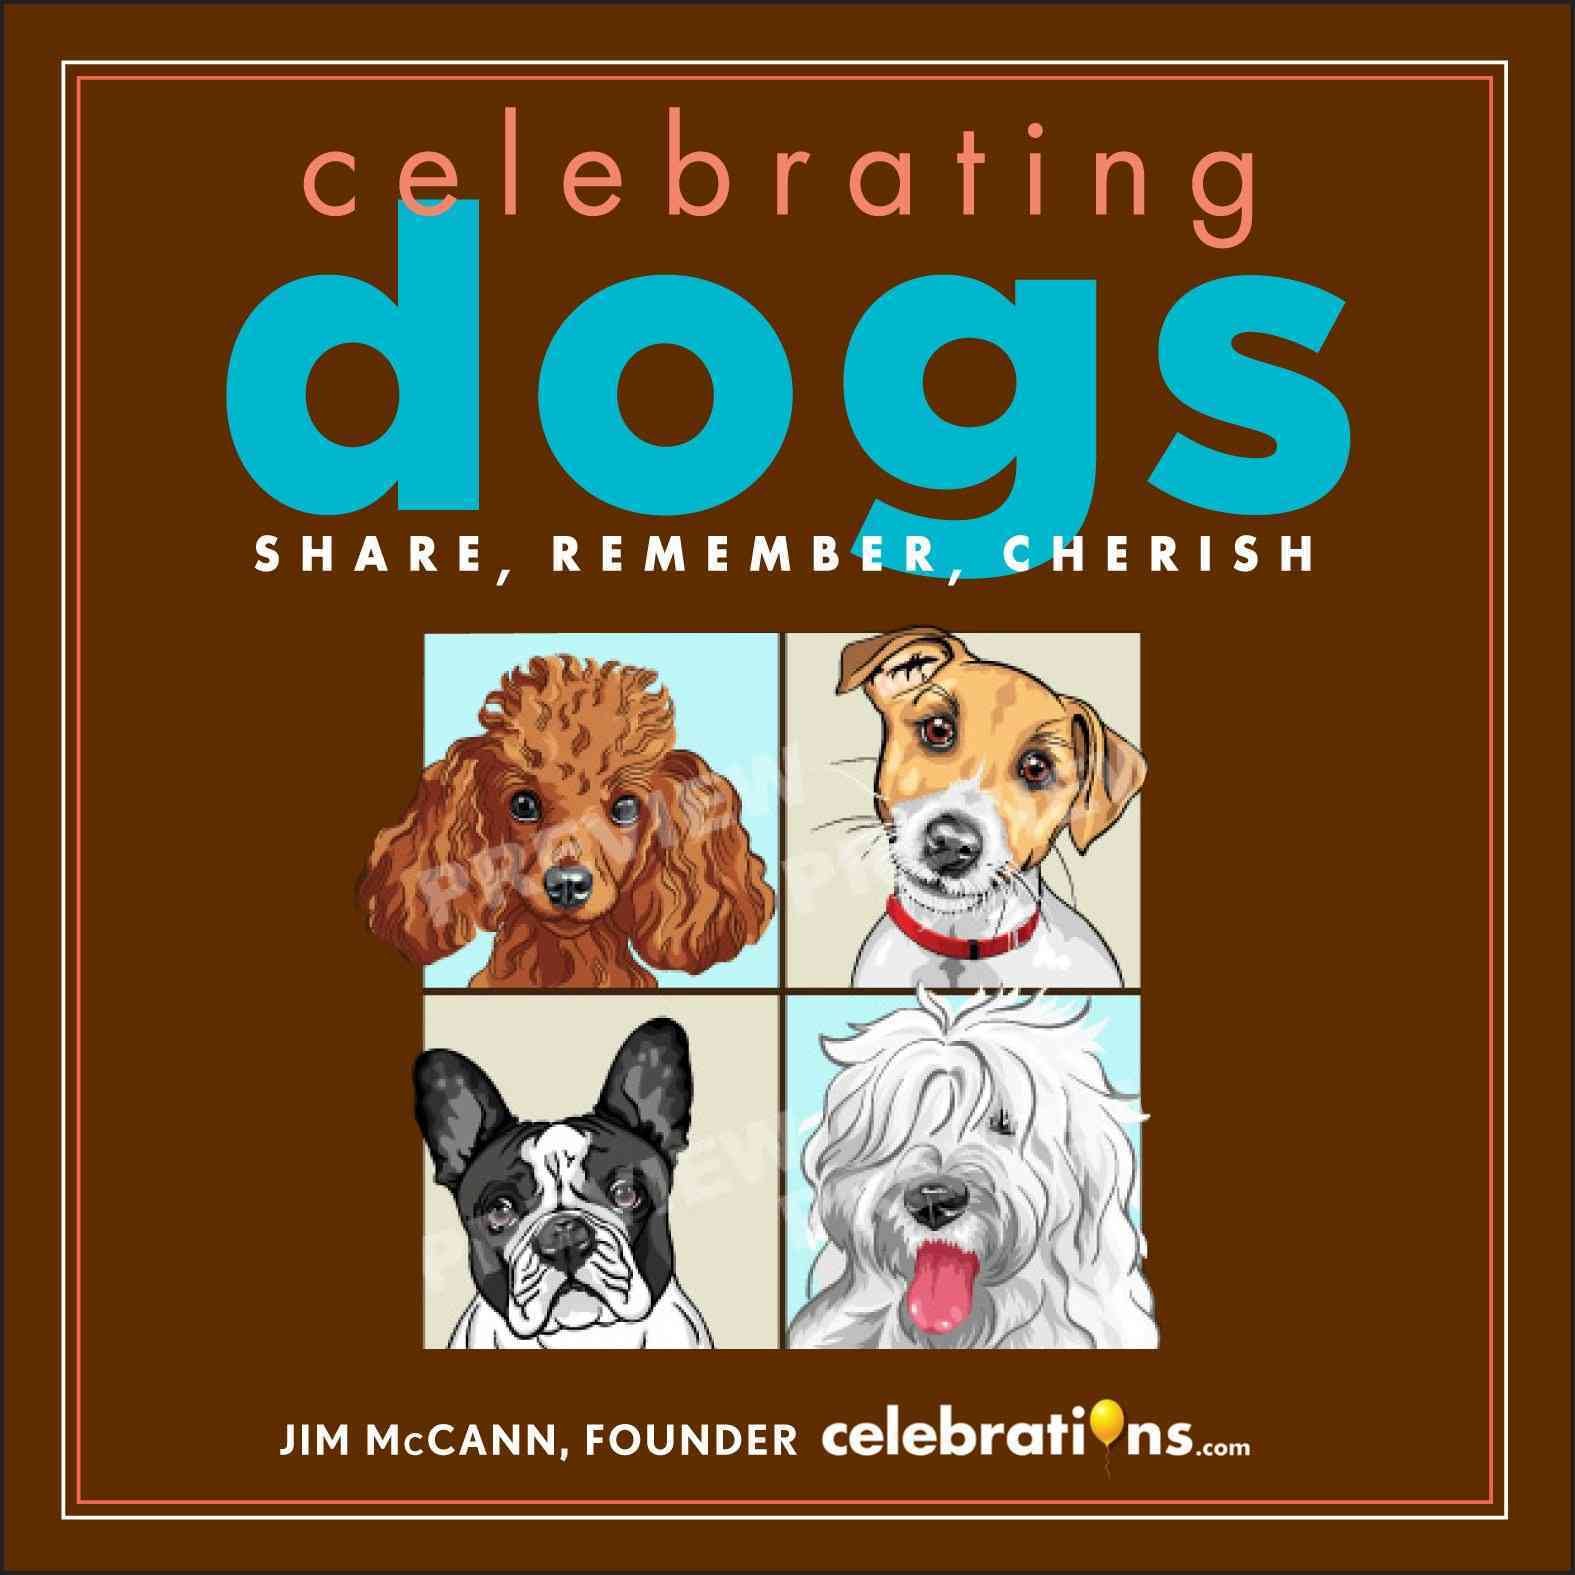 Celebrating Dogs: Share, Remember, Cherish (Hardcover)